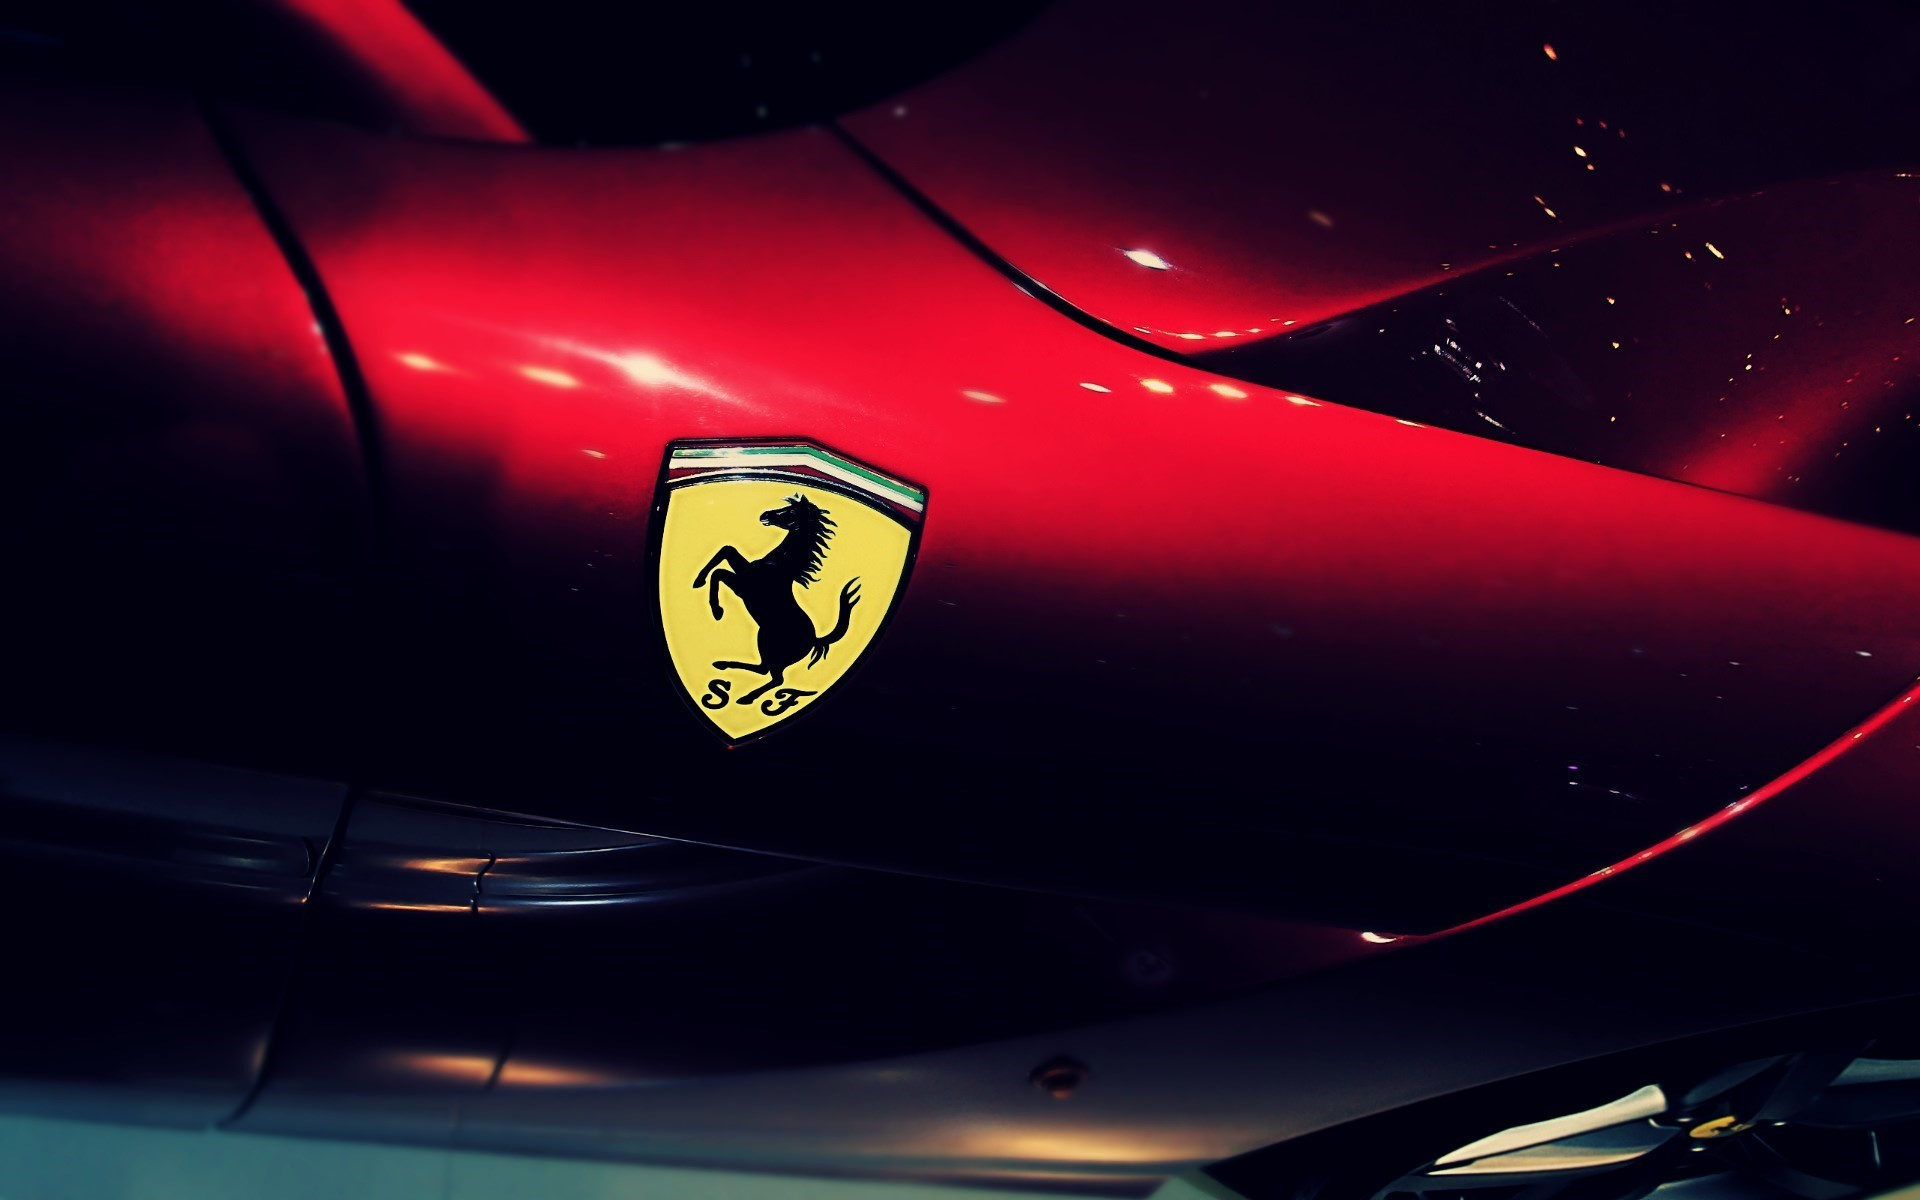 Ferrari iphone Wallpaper